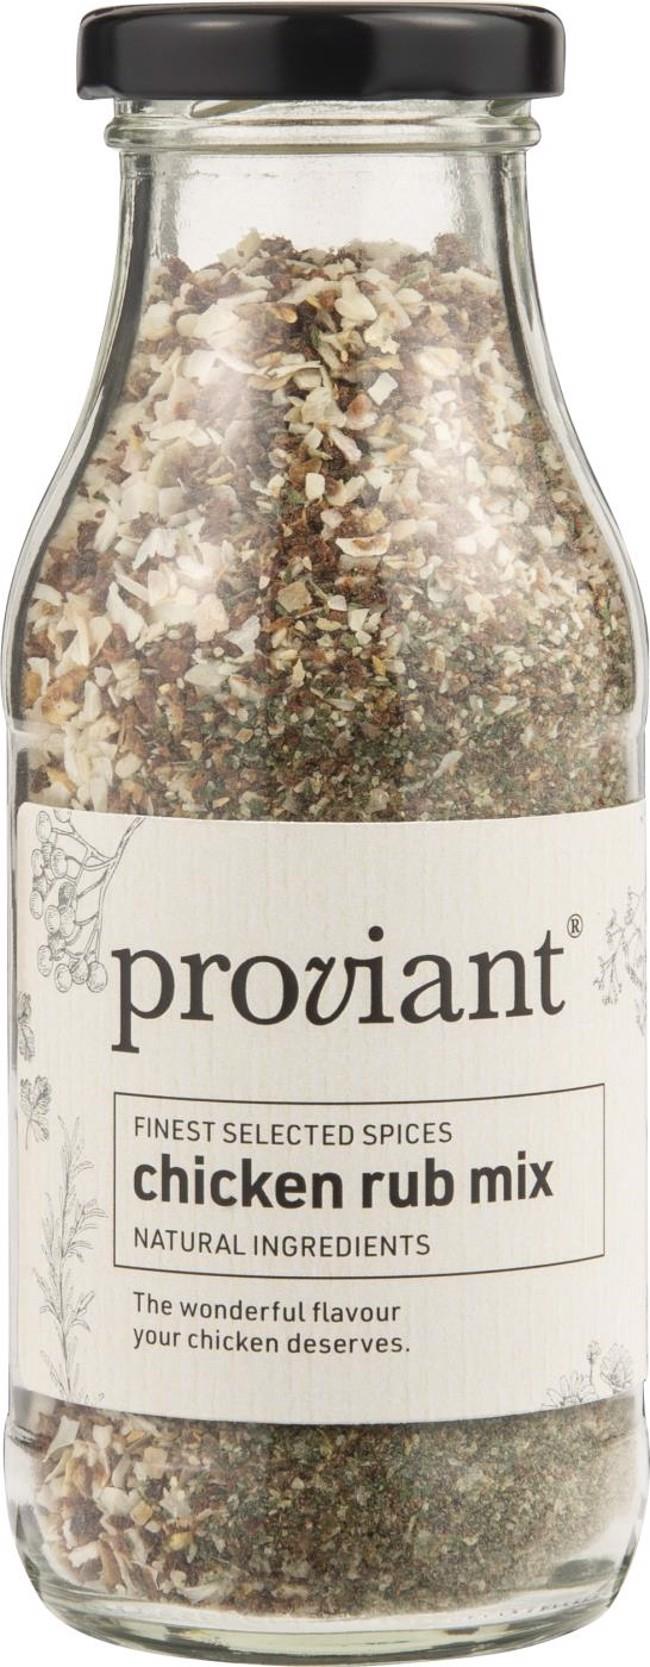 Image of   Proviant chicken rub mix 150 g fra Ib Laursen